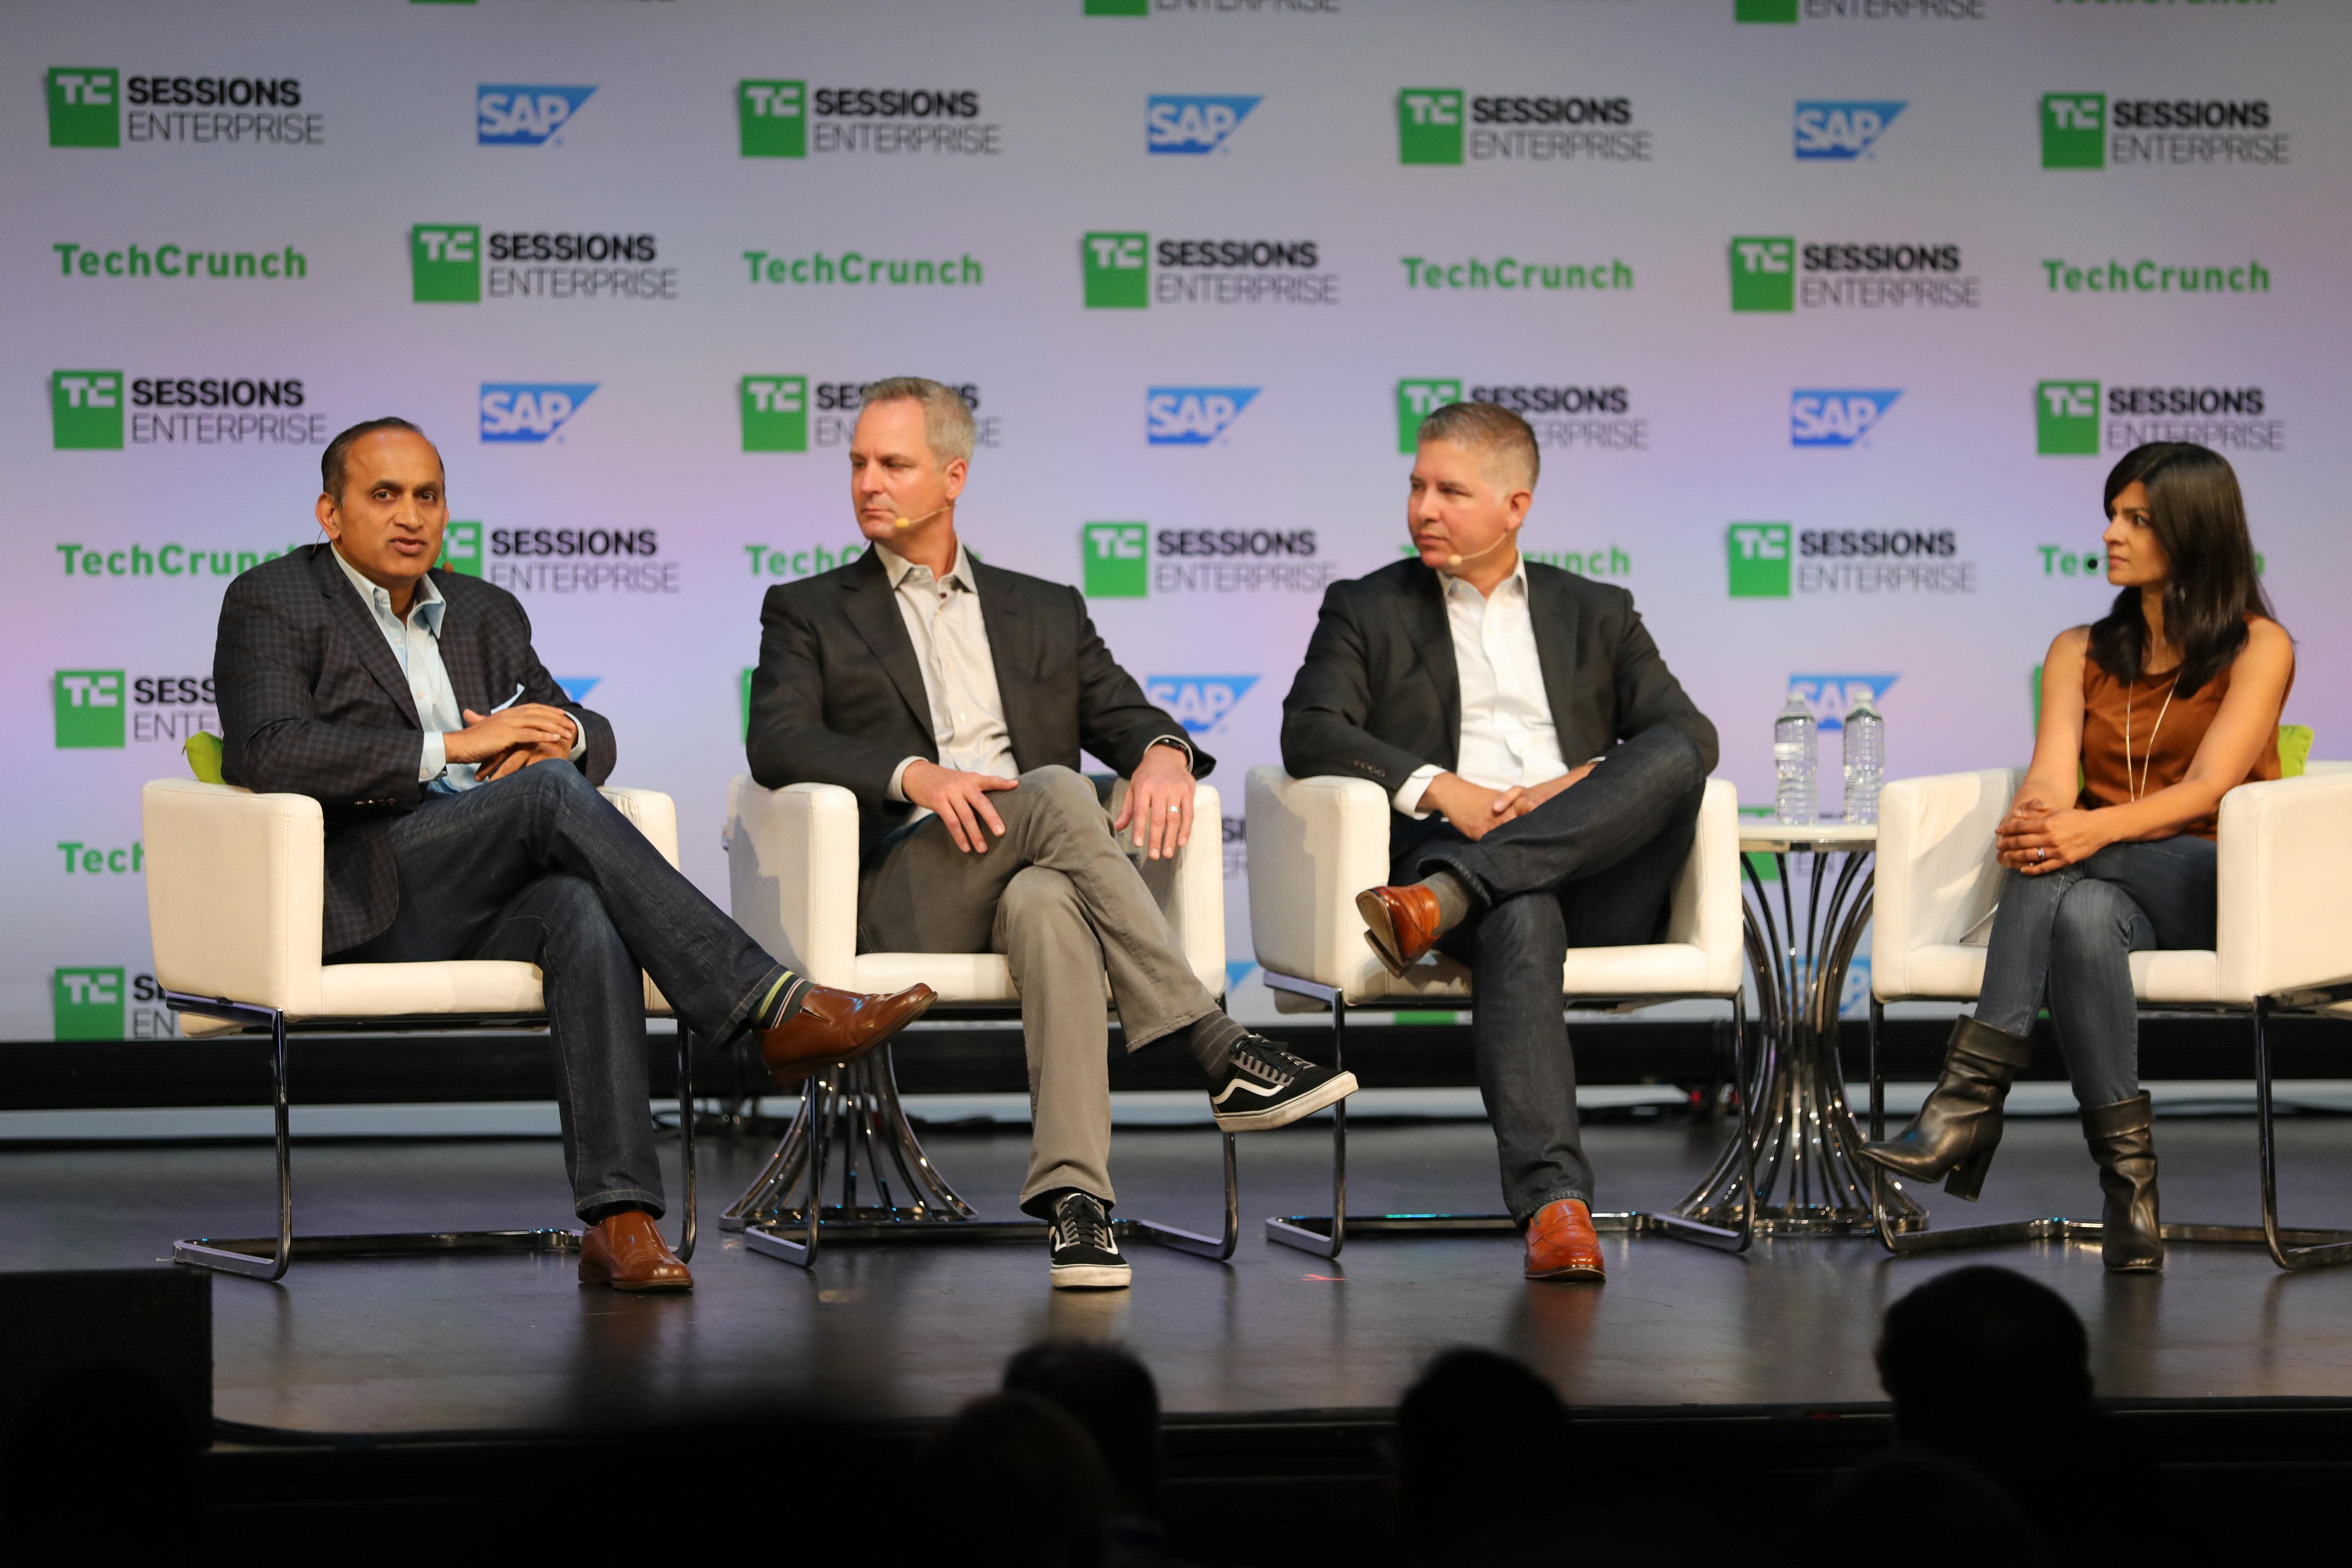 Innovation Break: Deliver Innovation to the Enterprise with Monty Gray  (Okta), DJ Paoni (SAP), Sanjay Poonen (VMWare) and Shruti Tournatory  (Sapphire Ventures)